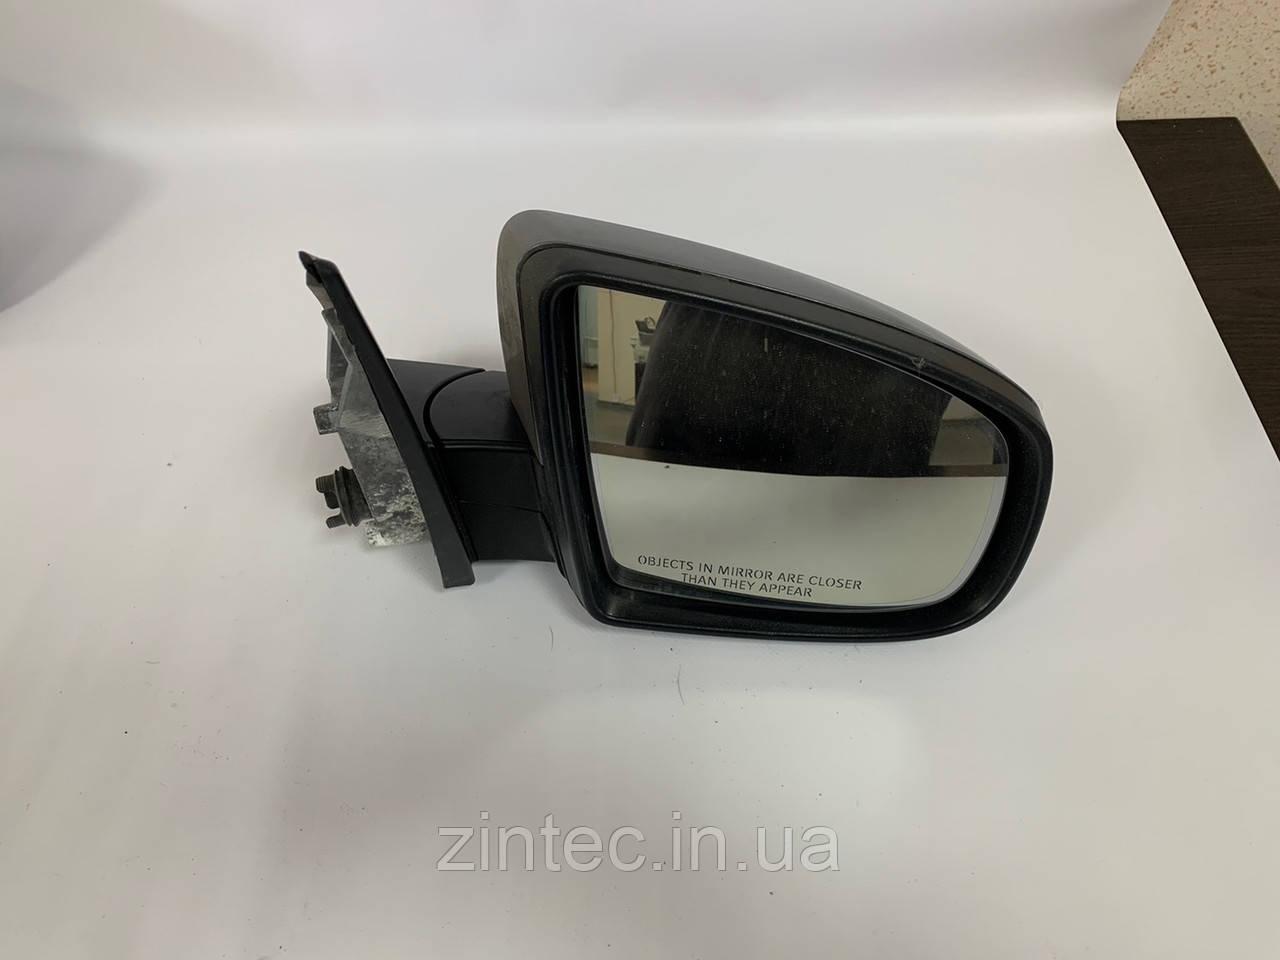 Зеркало правое BMW X5 Е70 2007-2013 год